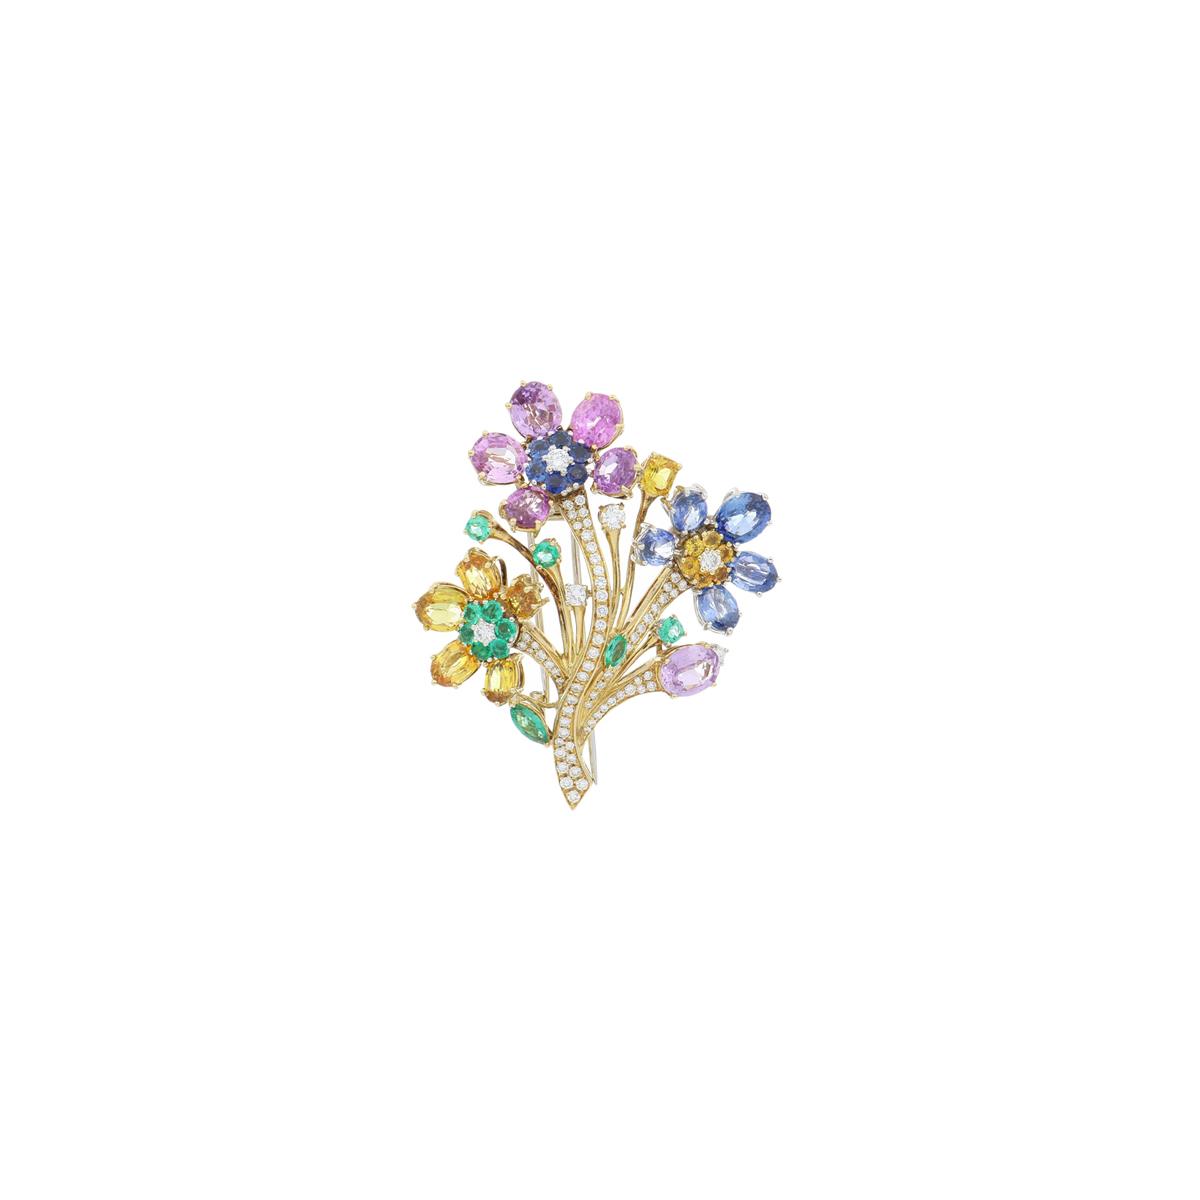 Multi-Gem Flower Brooch with Diamonds